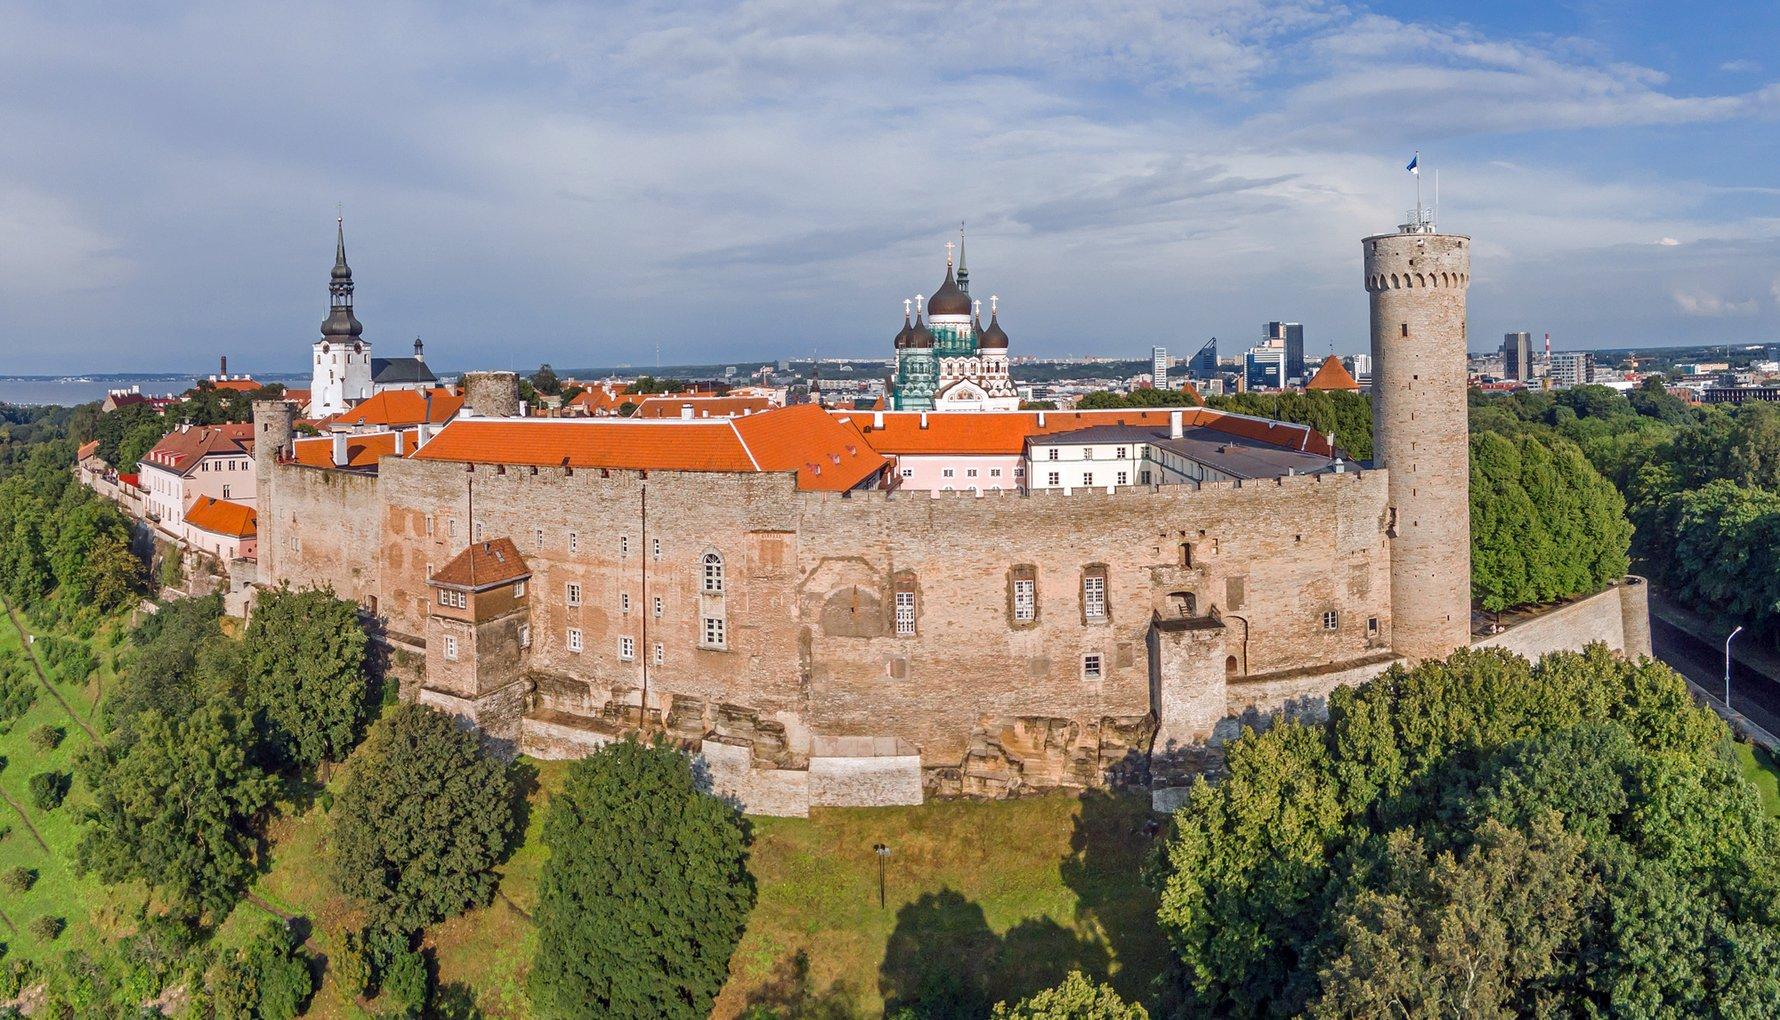 Toompea Hill. Photo by Kaupo Kalda. Visit Tallinn.